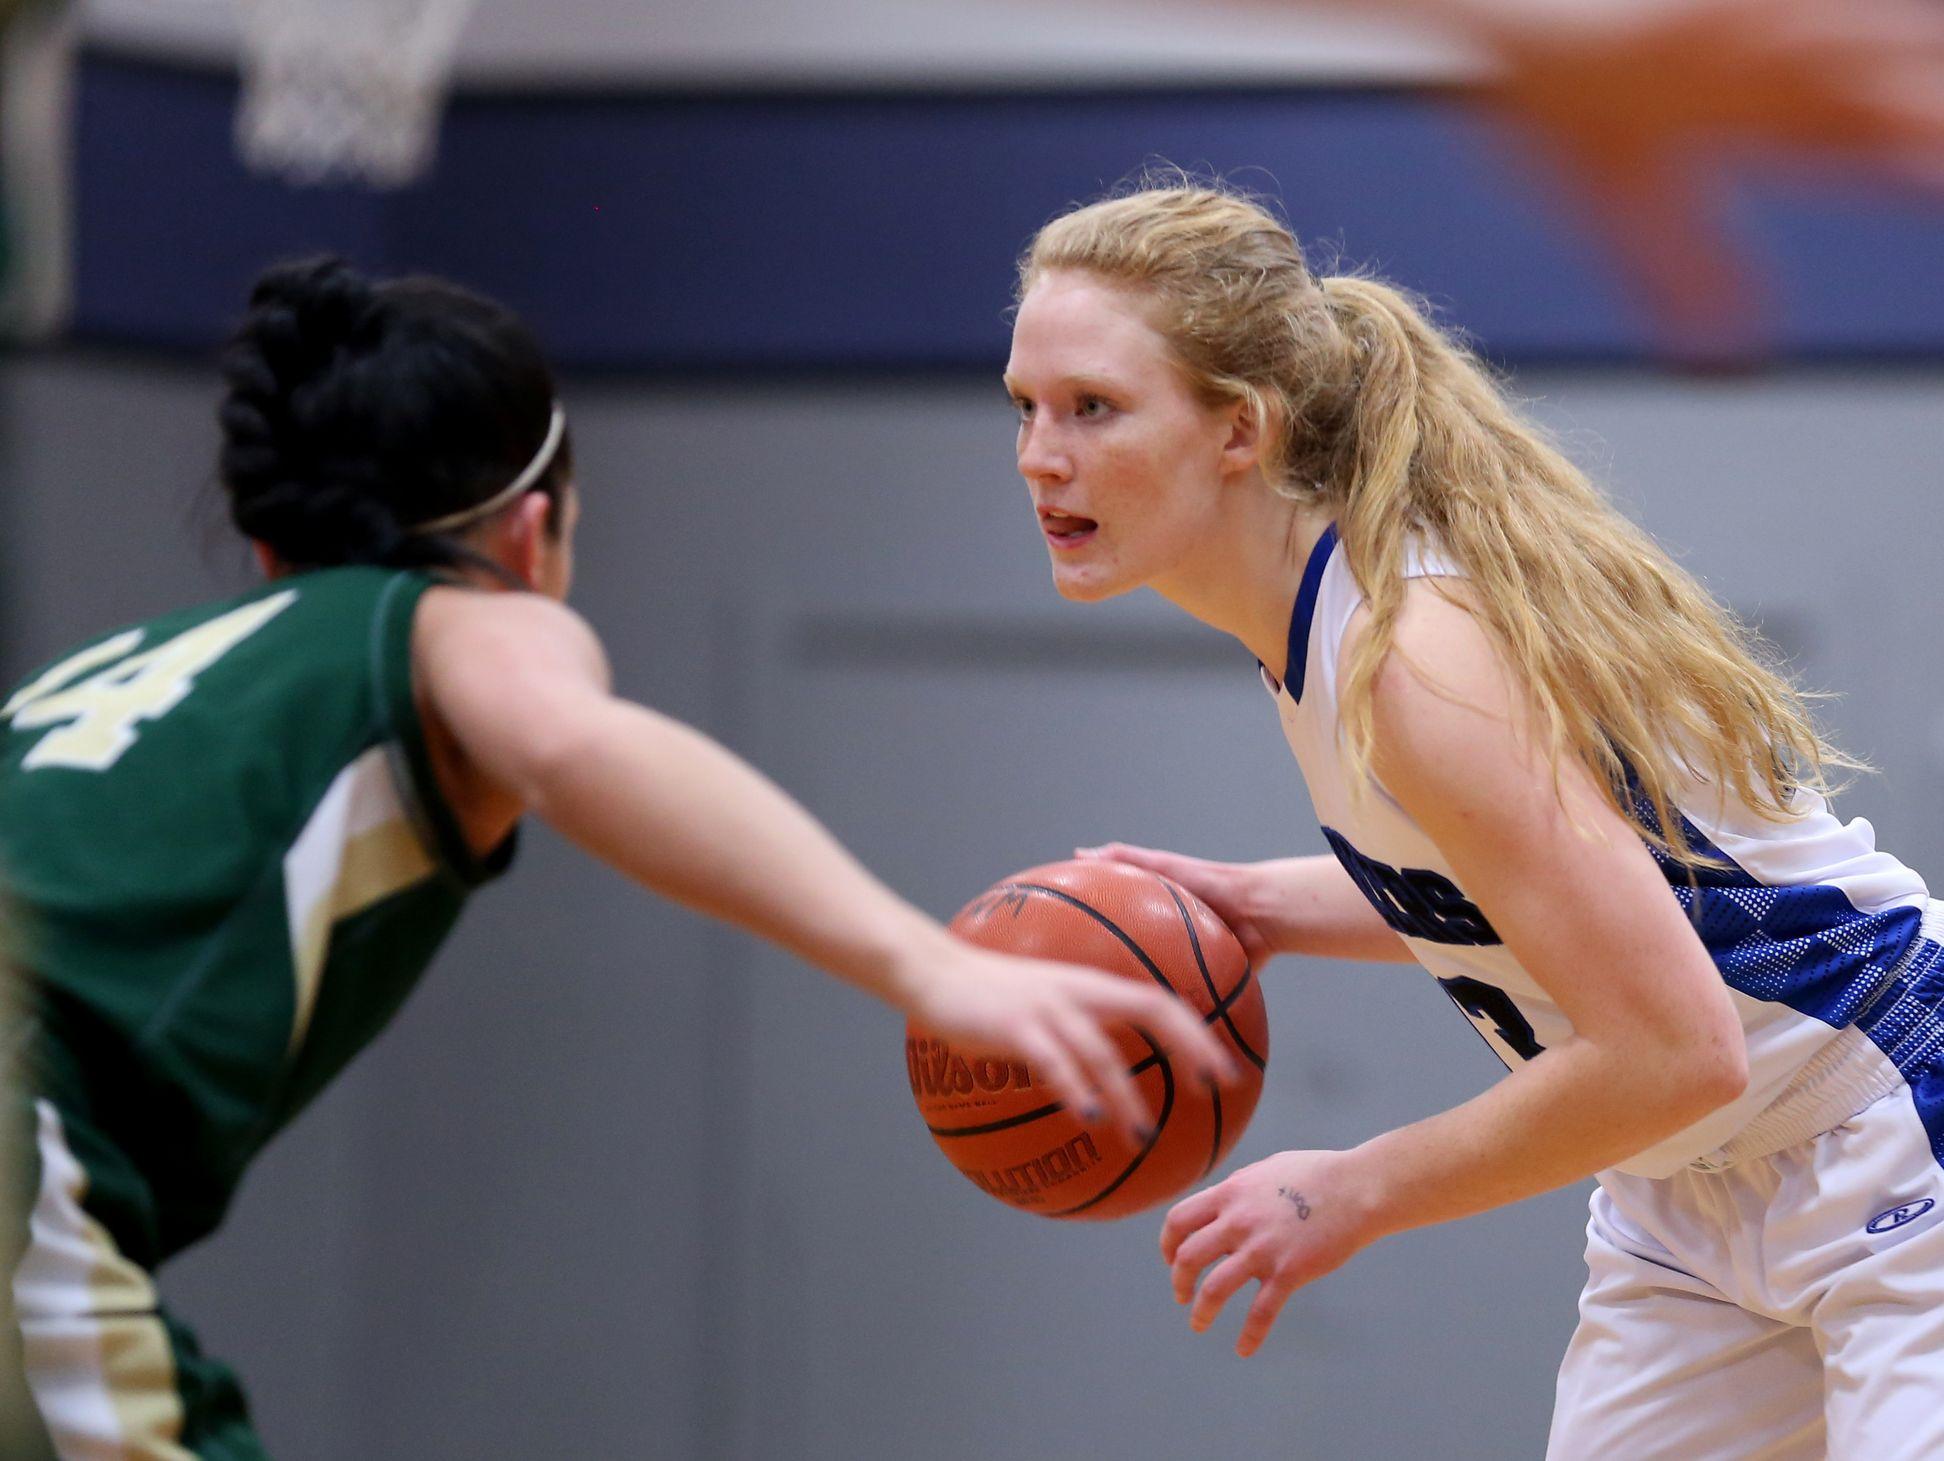 Western Mennonite's Madison Hull (13) moves past Regis' Ashtyn Chamberland (14) in the Regis vs. Western Mennonite girl's basketball game at Western Mennonite High School on Wednesday, Feb. 17, 2016.